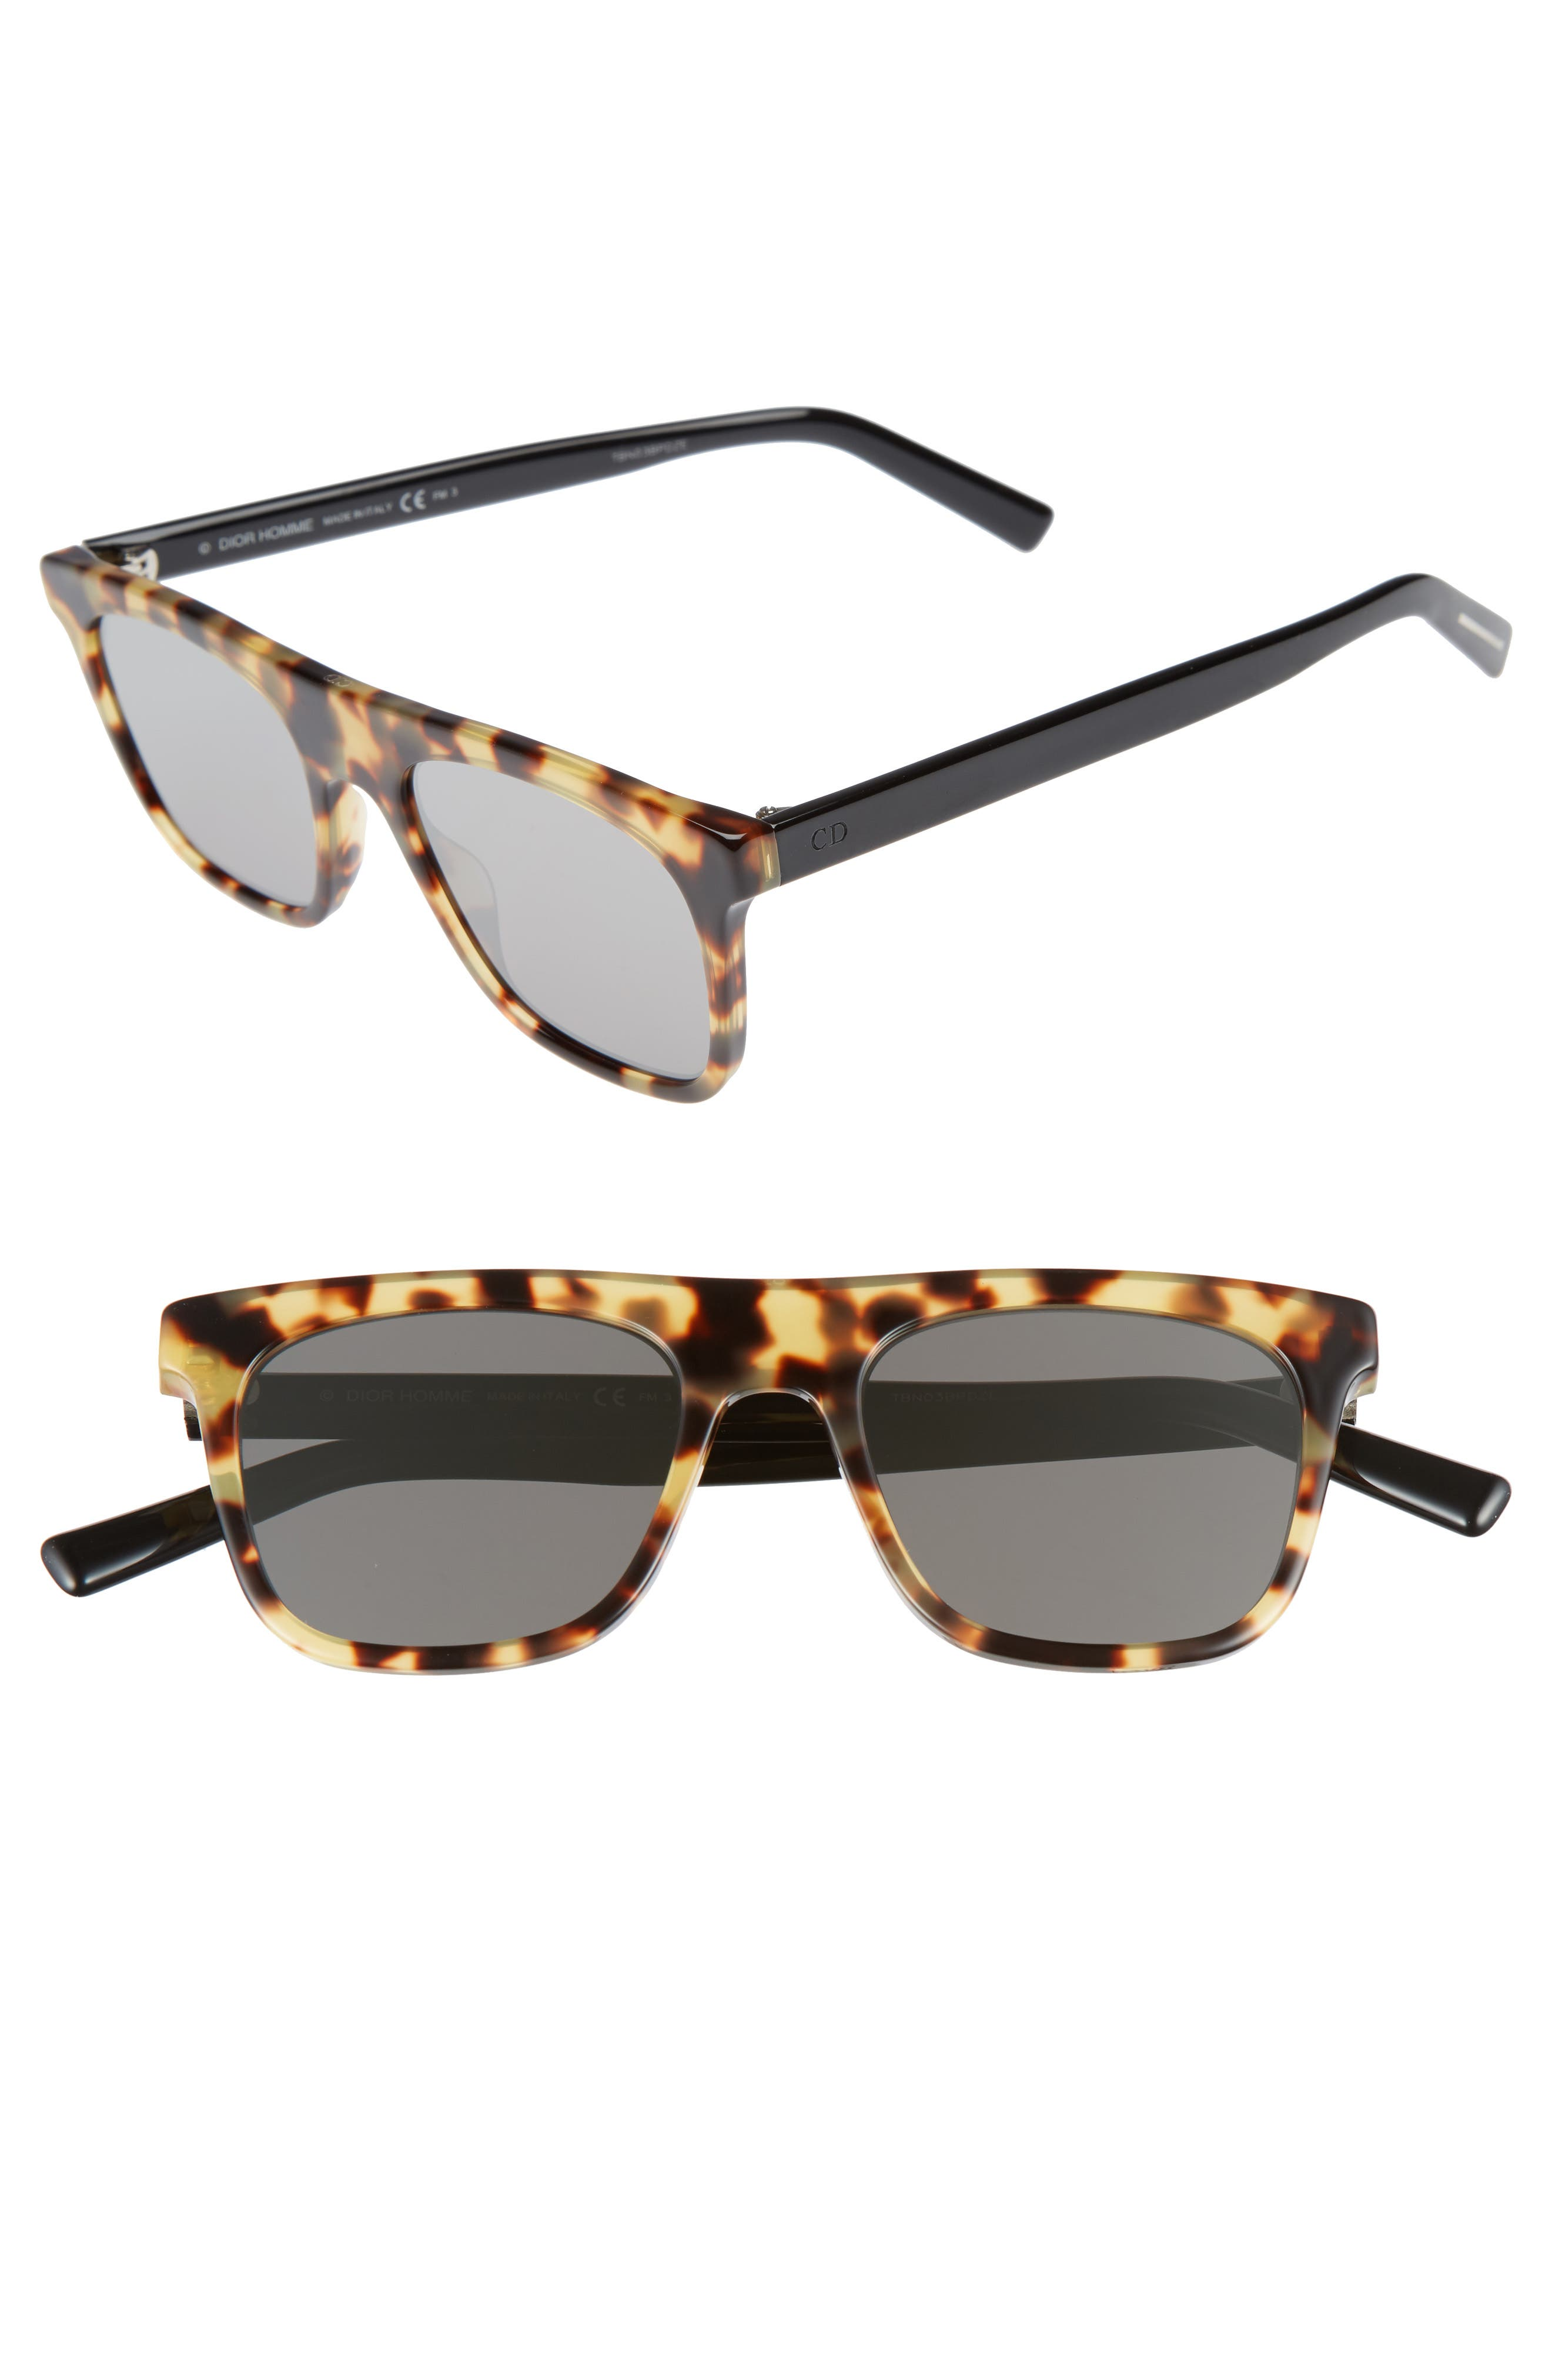 Walk 51mm Sunglasses,                         Main,                         color, Havana Black/ Grey